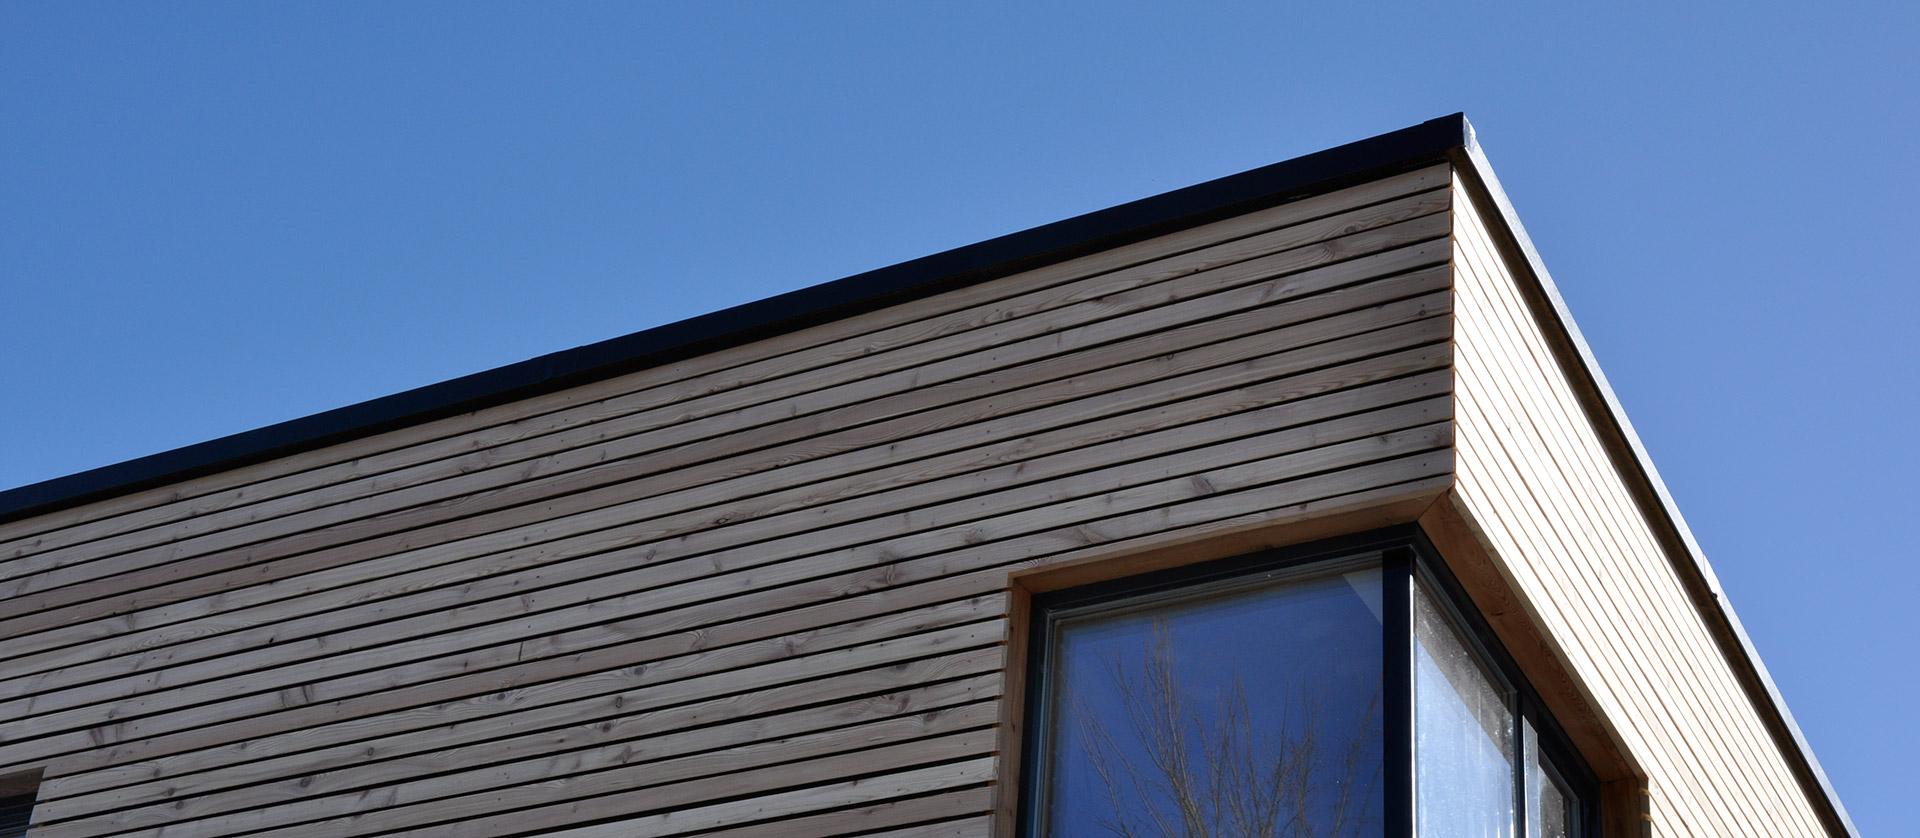 Holz-Fassade - Serafin Campestrini GmbH - Ihr Partner in Sachen Holz